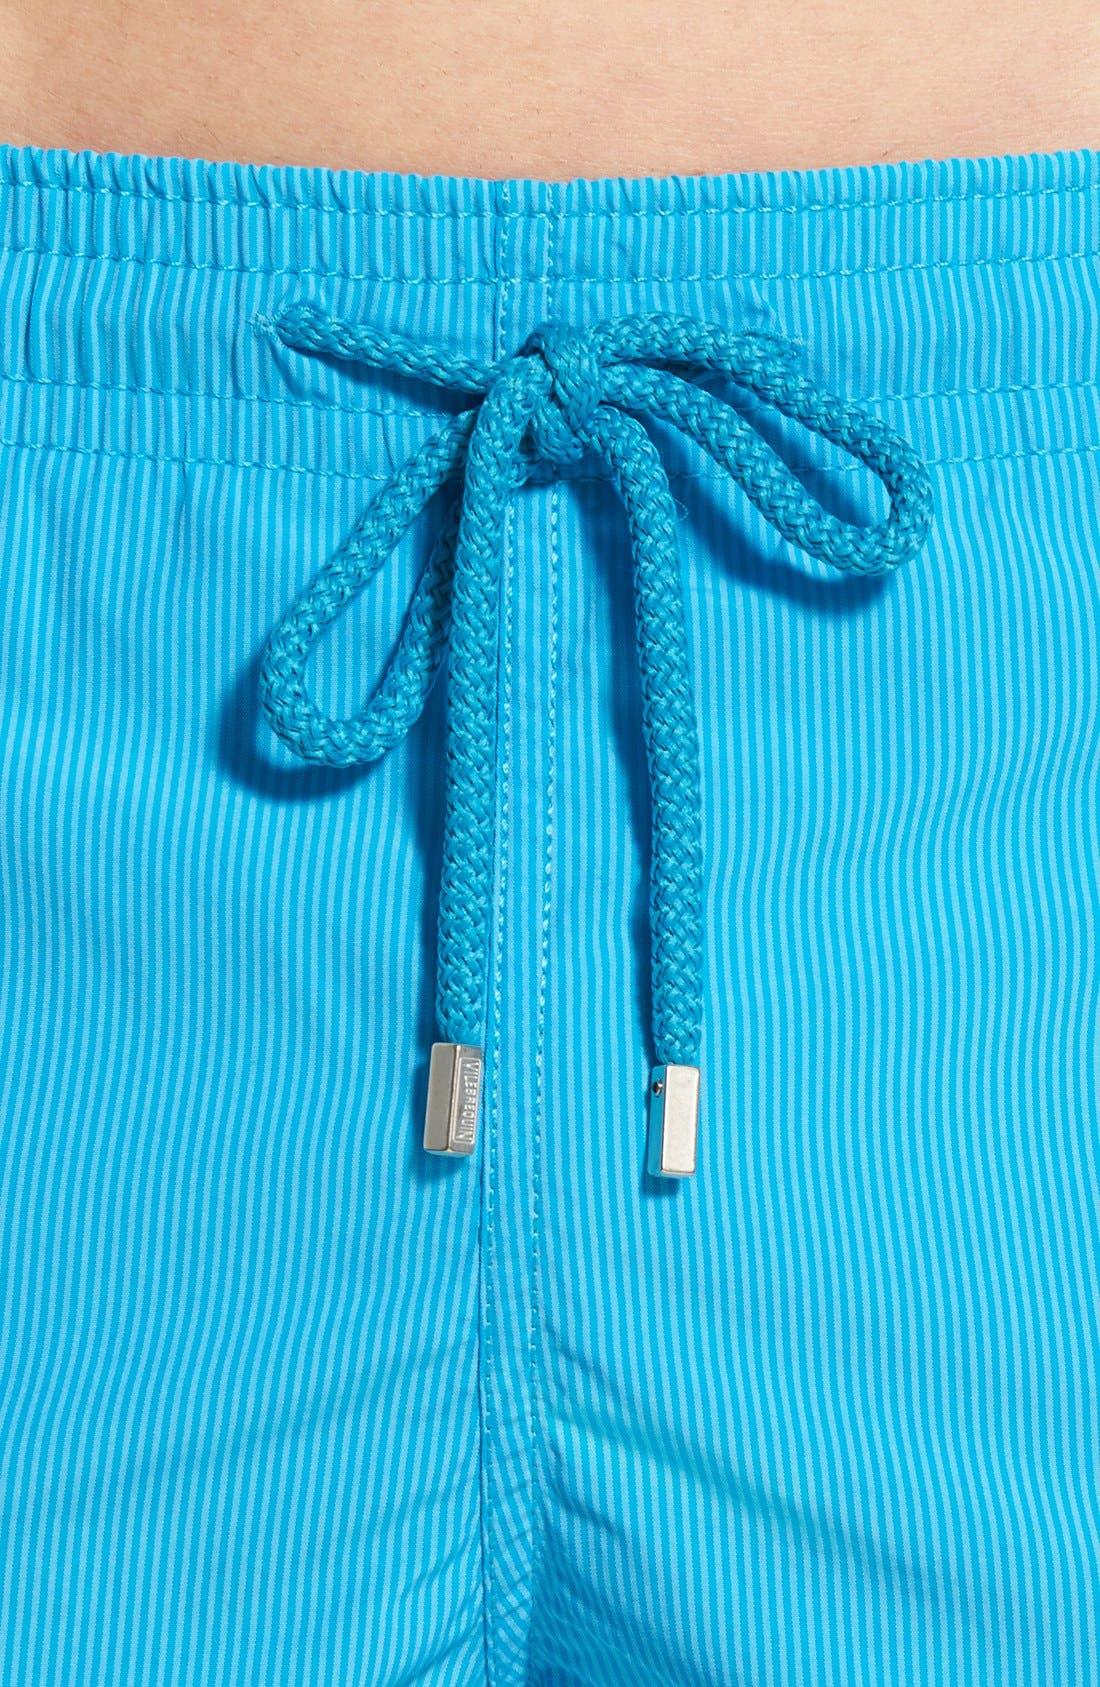 'Morio' Stripe Swim Trunks,                             Alternate thumbnail 4, color,                             474